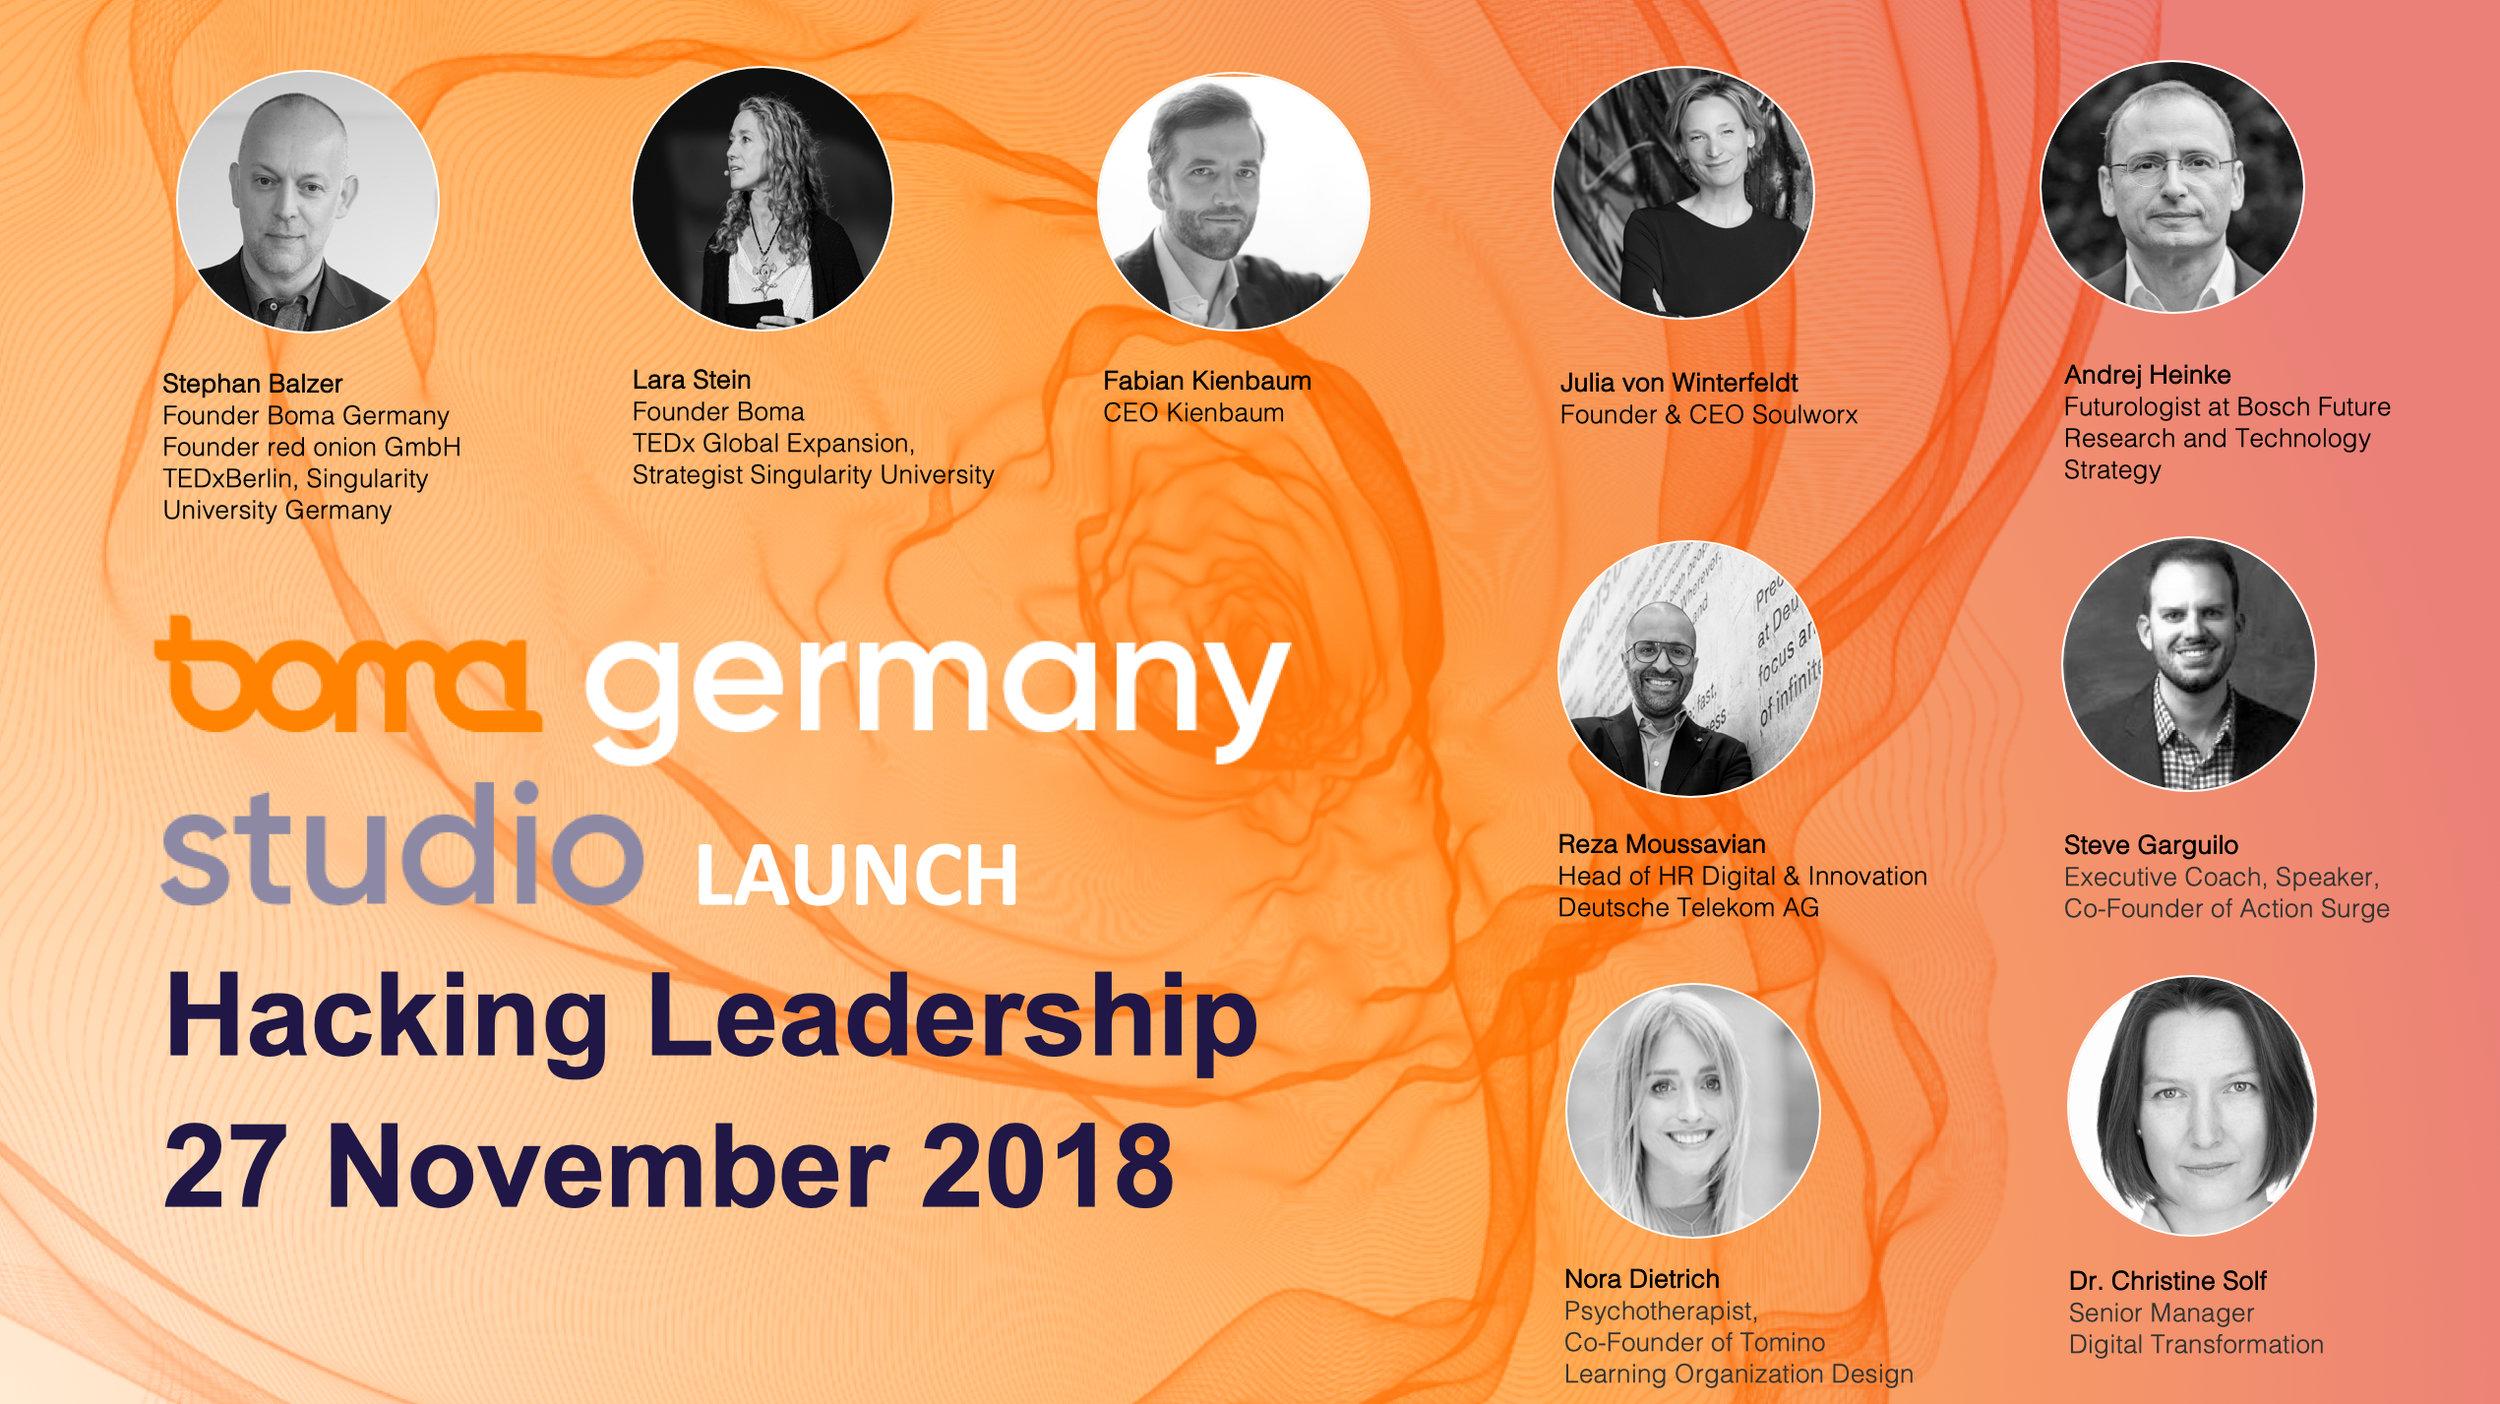 Boma Germany Hacking Leadership_Stephan Balzer.jpg